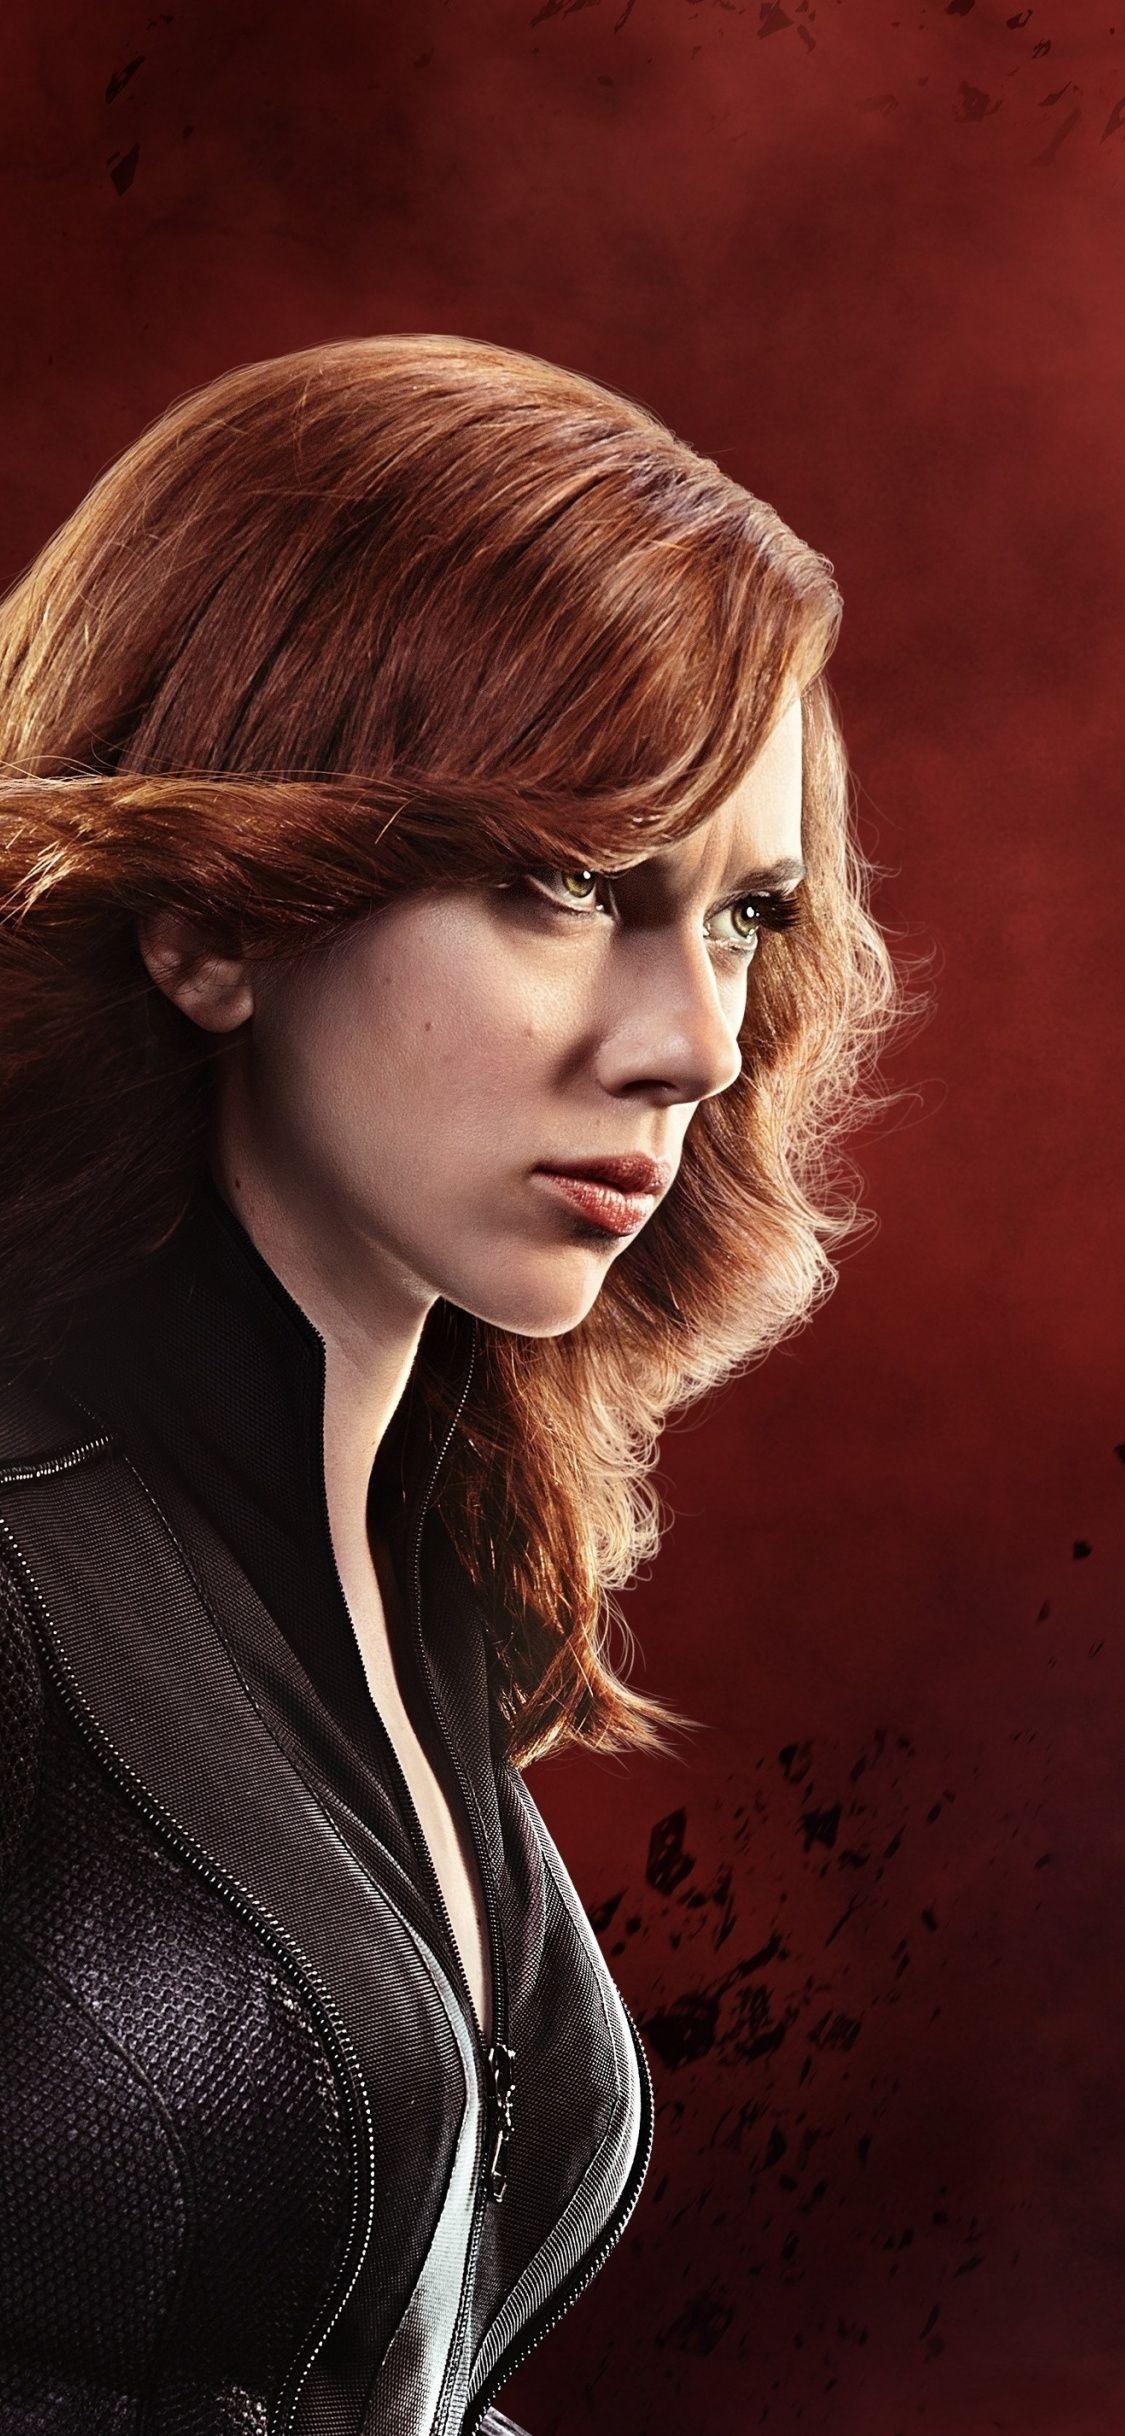 Actress Celebrity Scarlett Johansson Black Widow 1125x2436